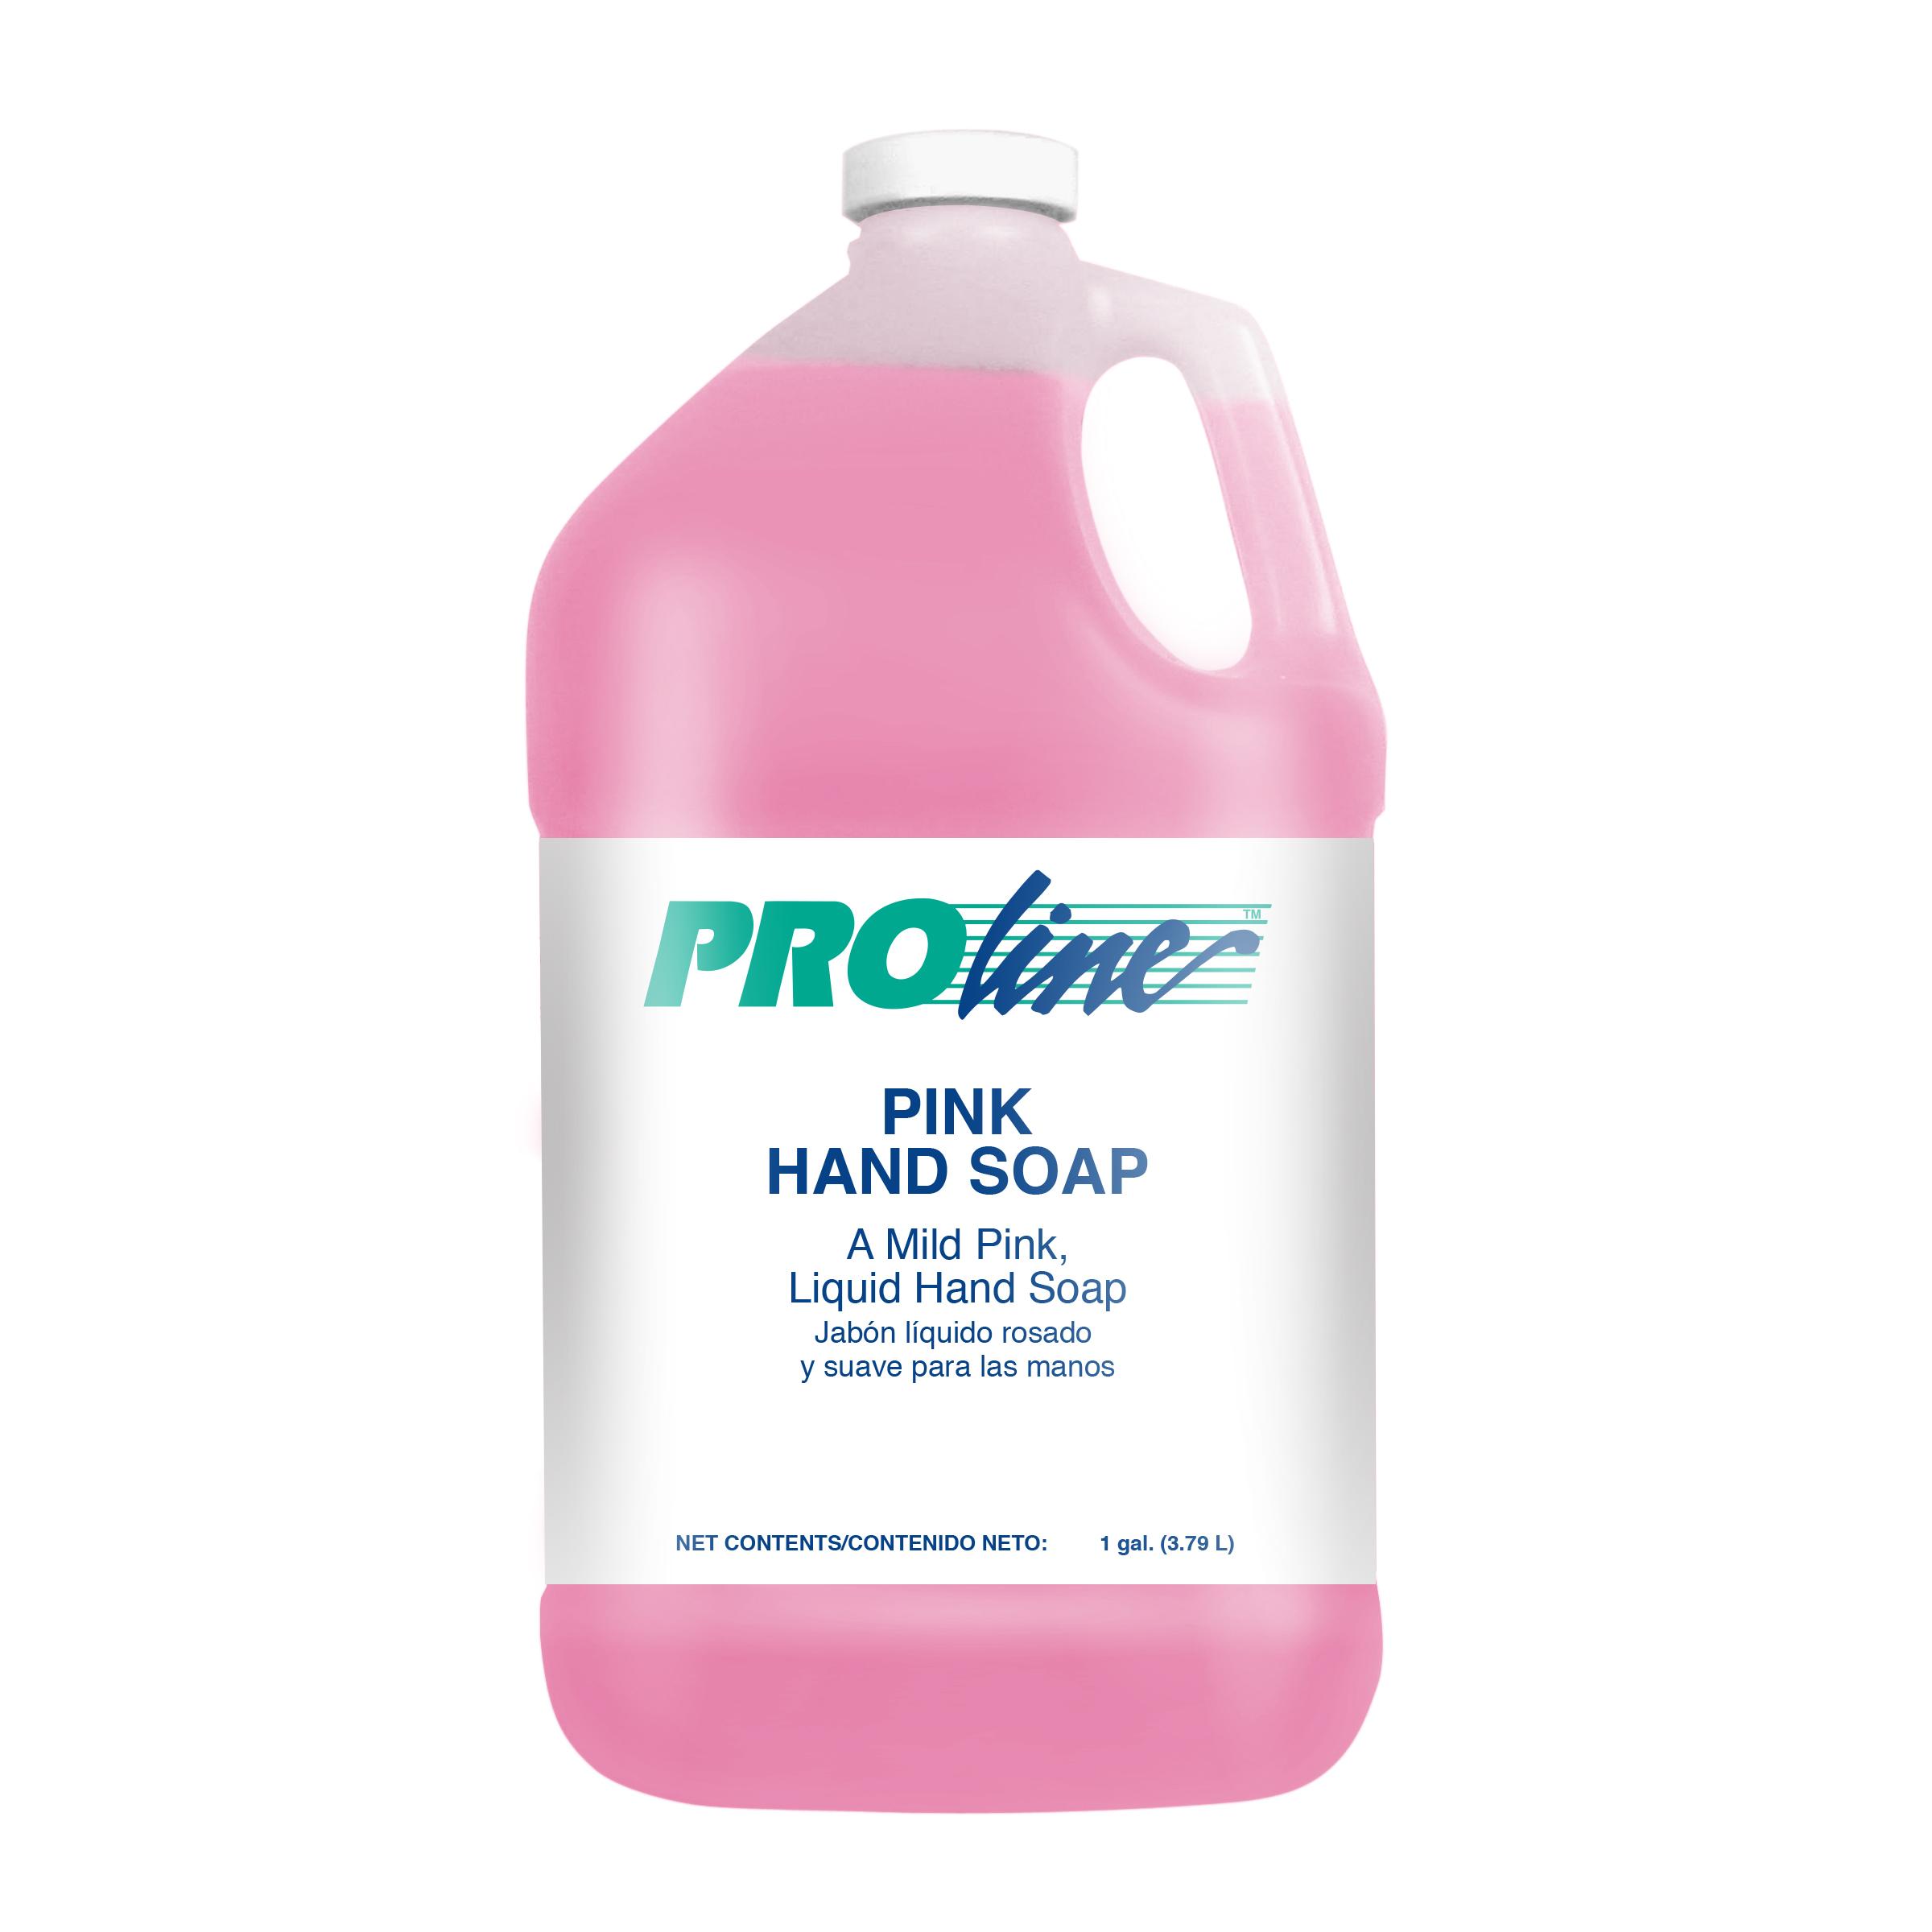 063655_PINK_HAND_SOAP_1GA